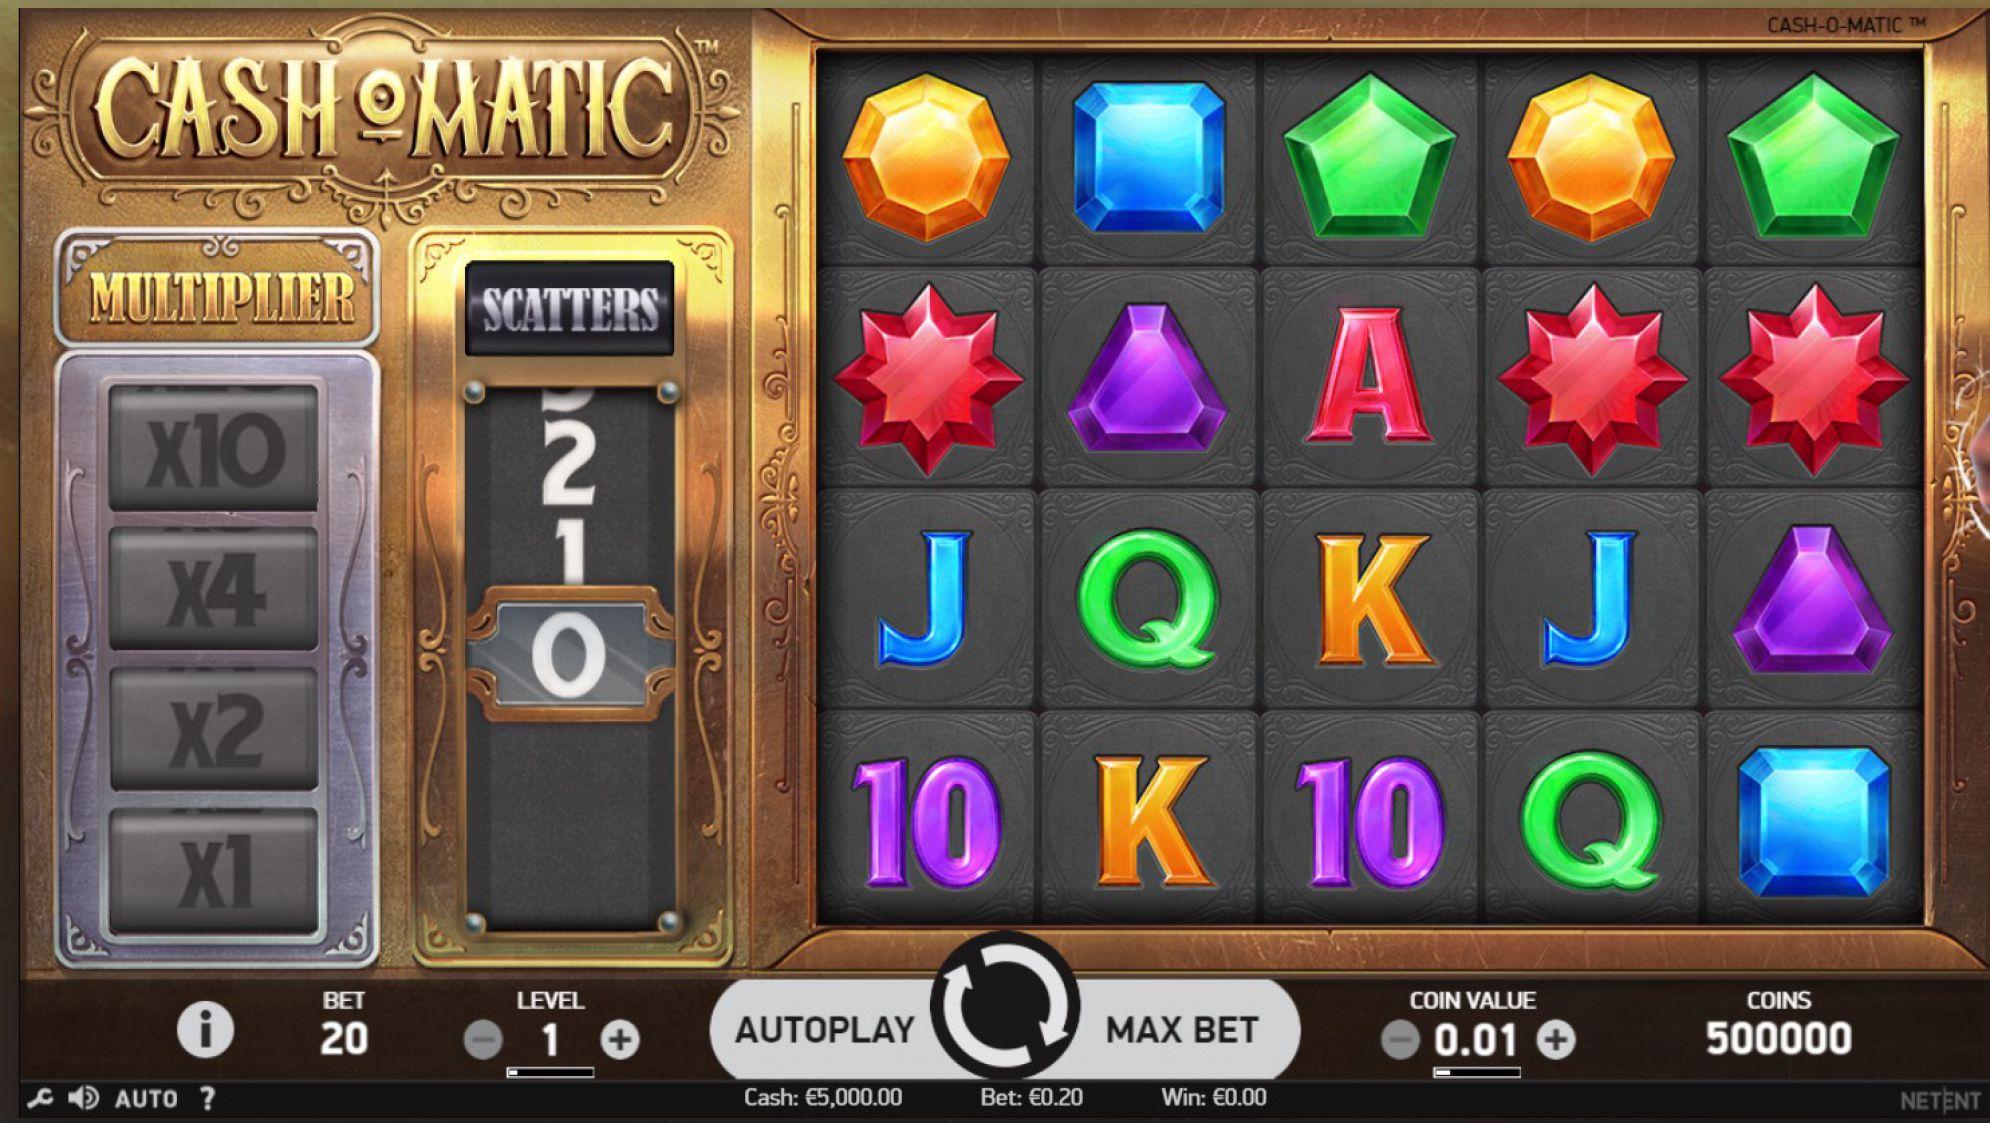 Cash-O-Matic Slot Images - CasinoTop